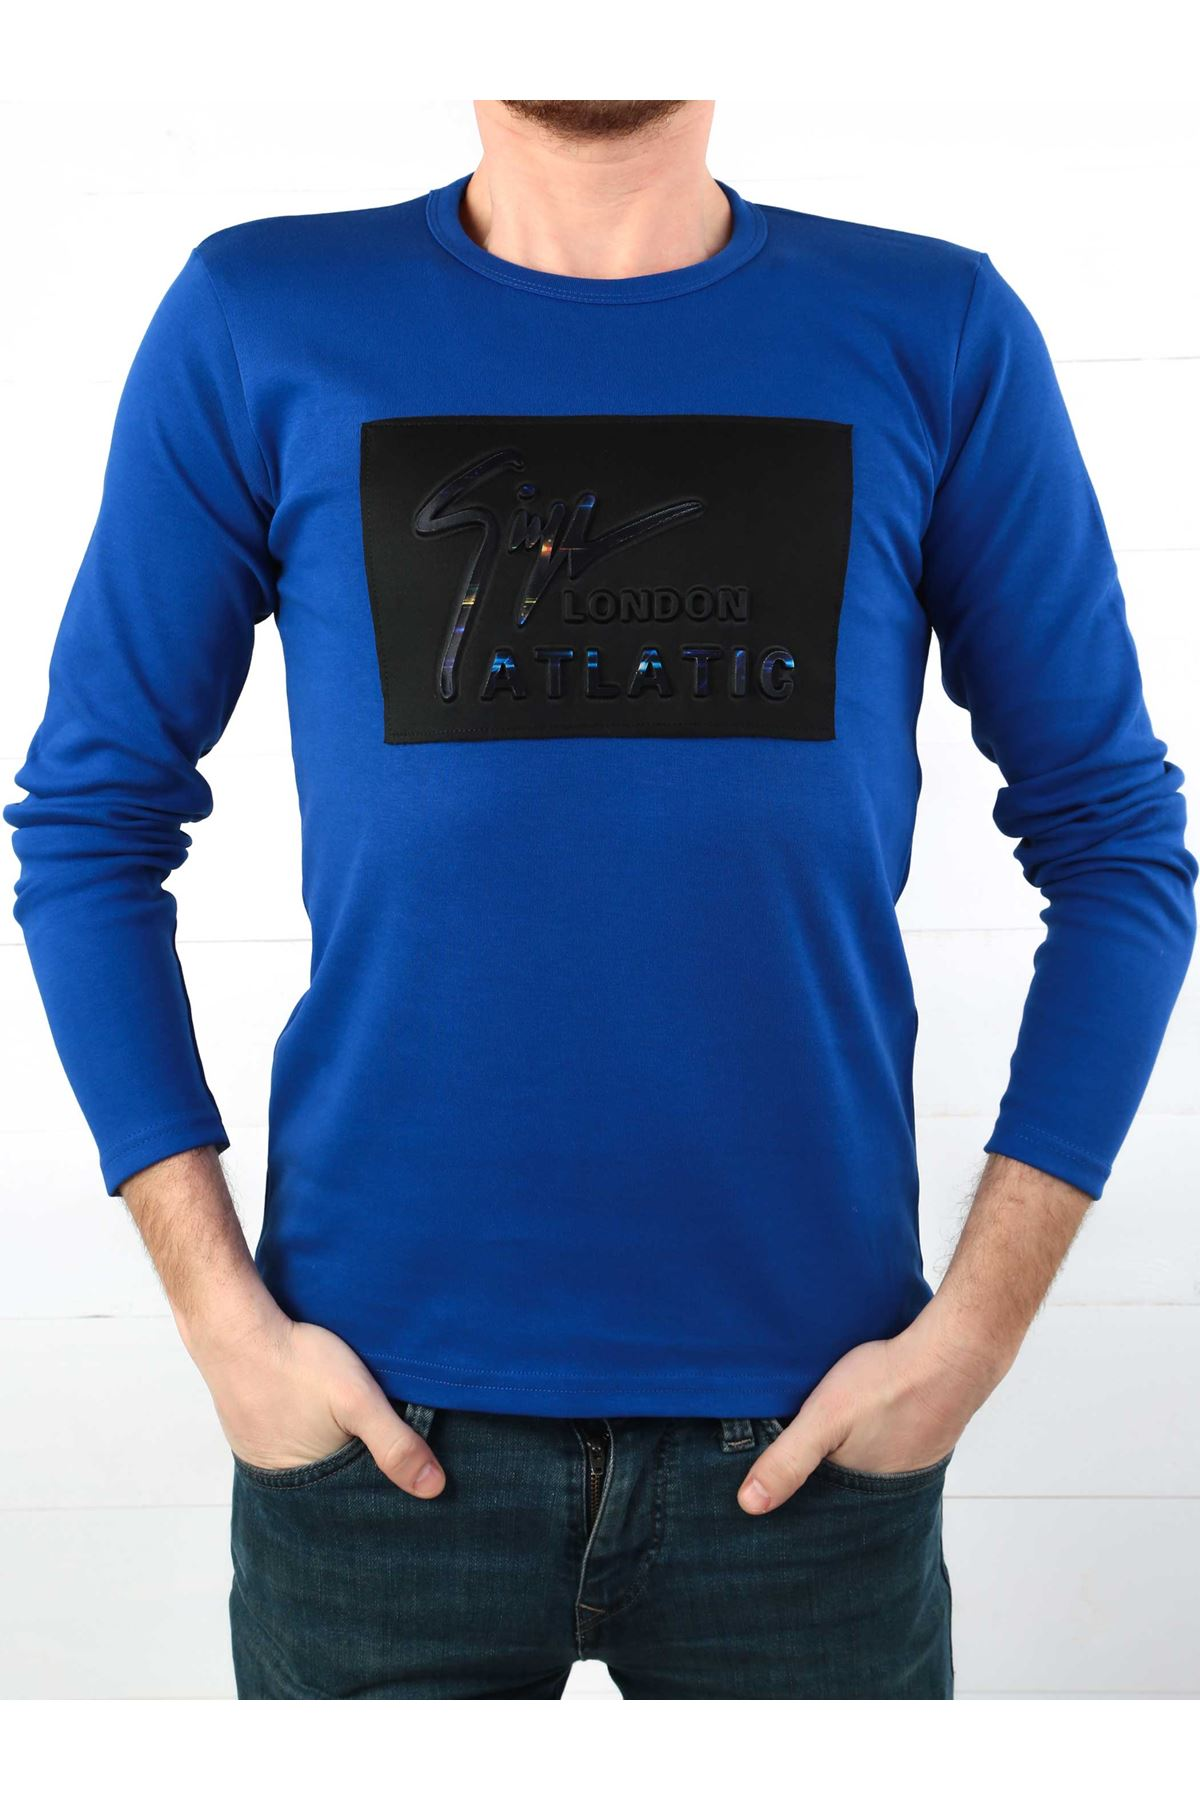 Sax İnterlok Erkek Sweatshirt